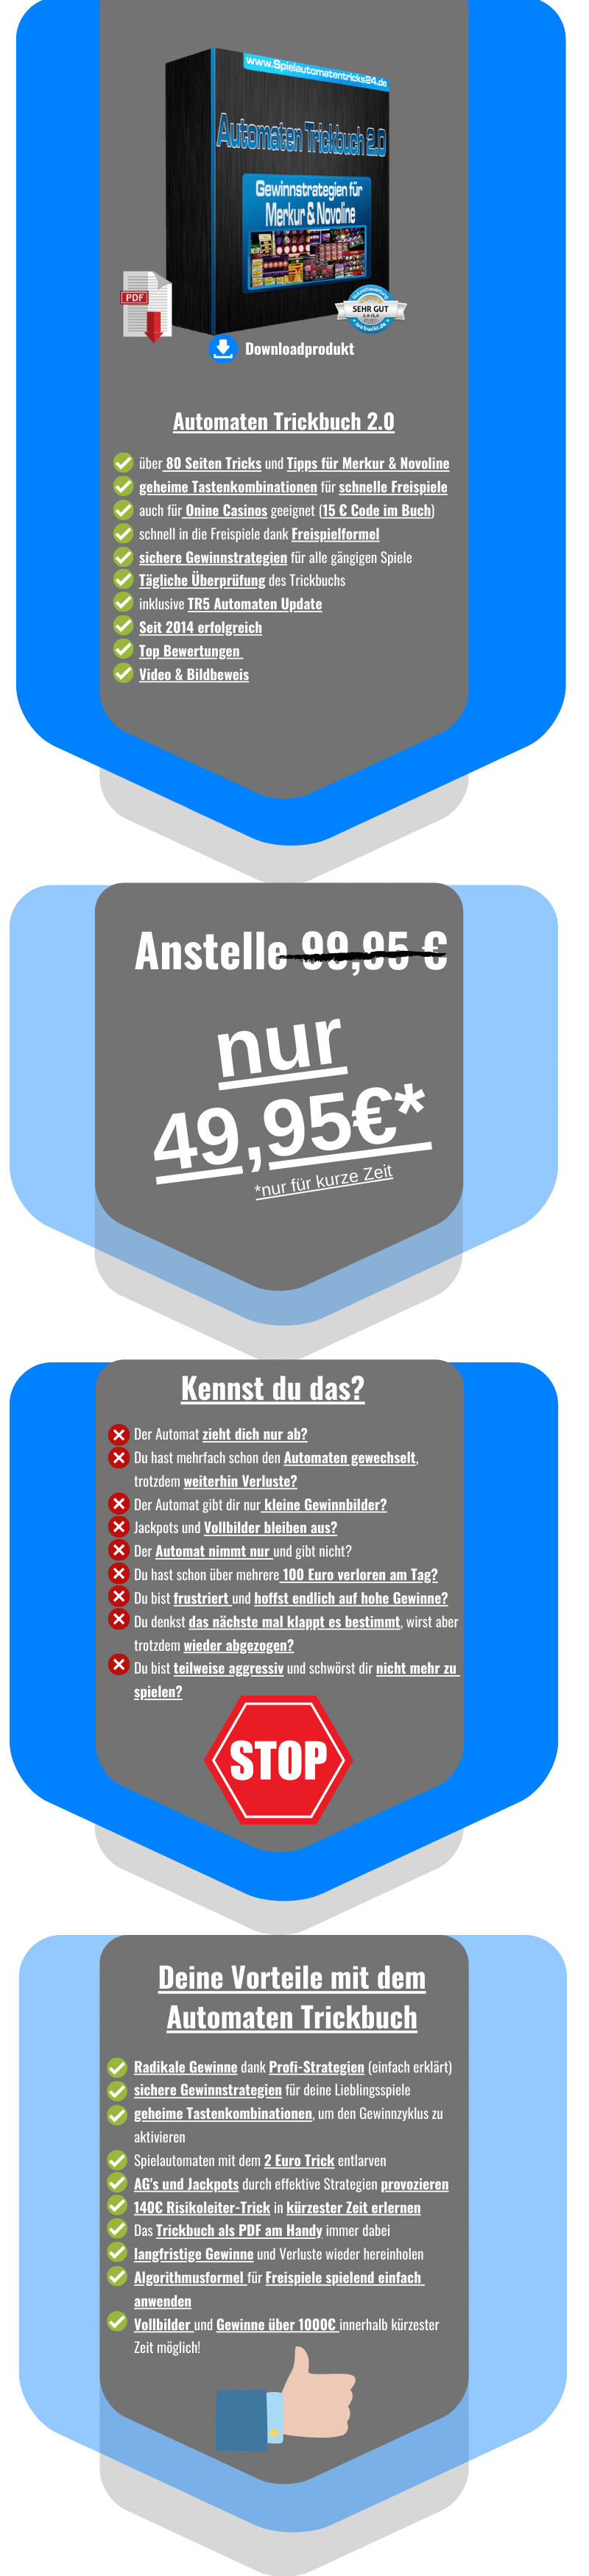 Automaten Trickbuch 2.0 Spielautomatentricks24